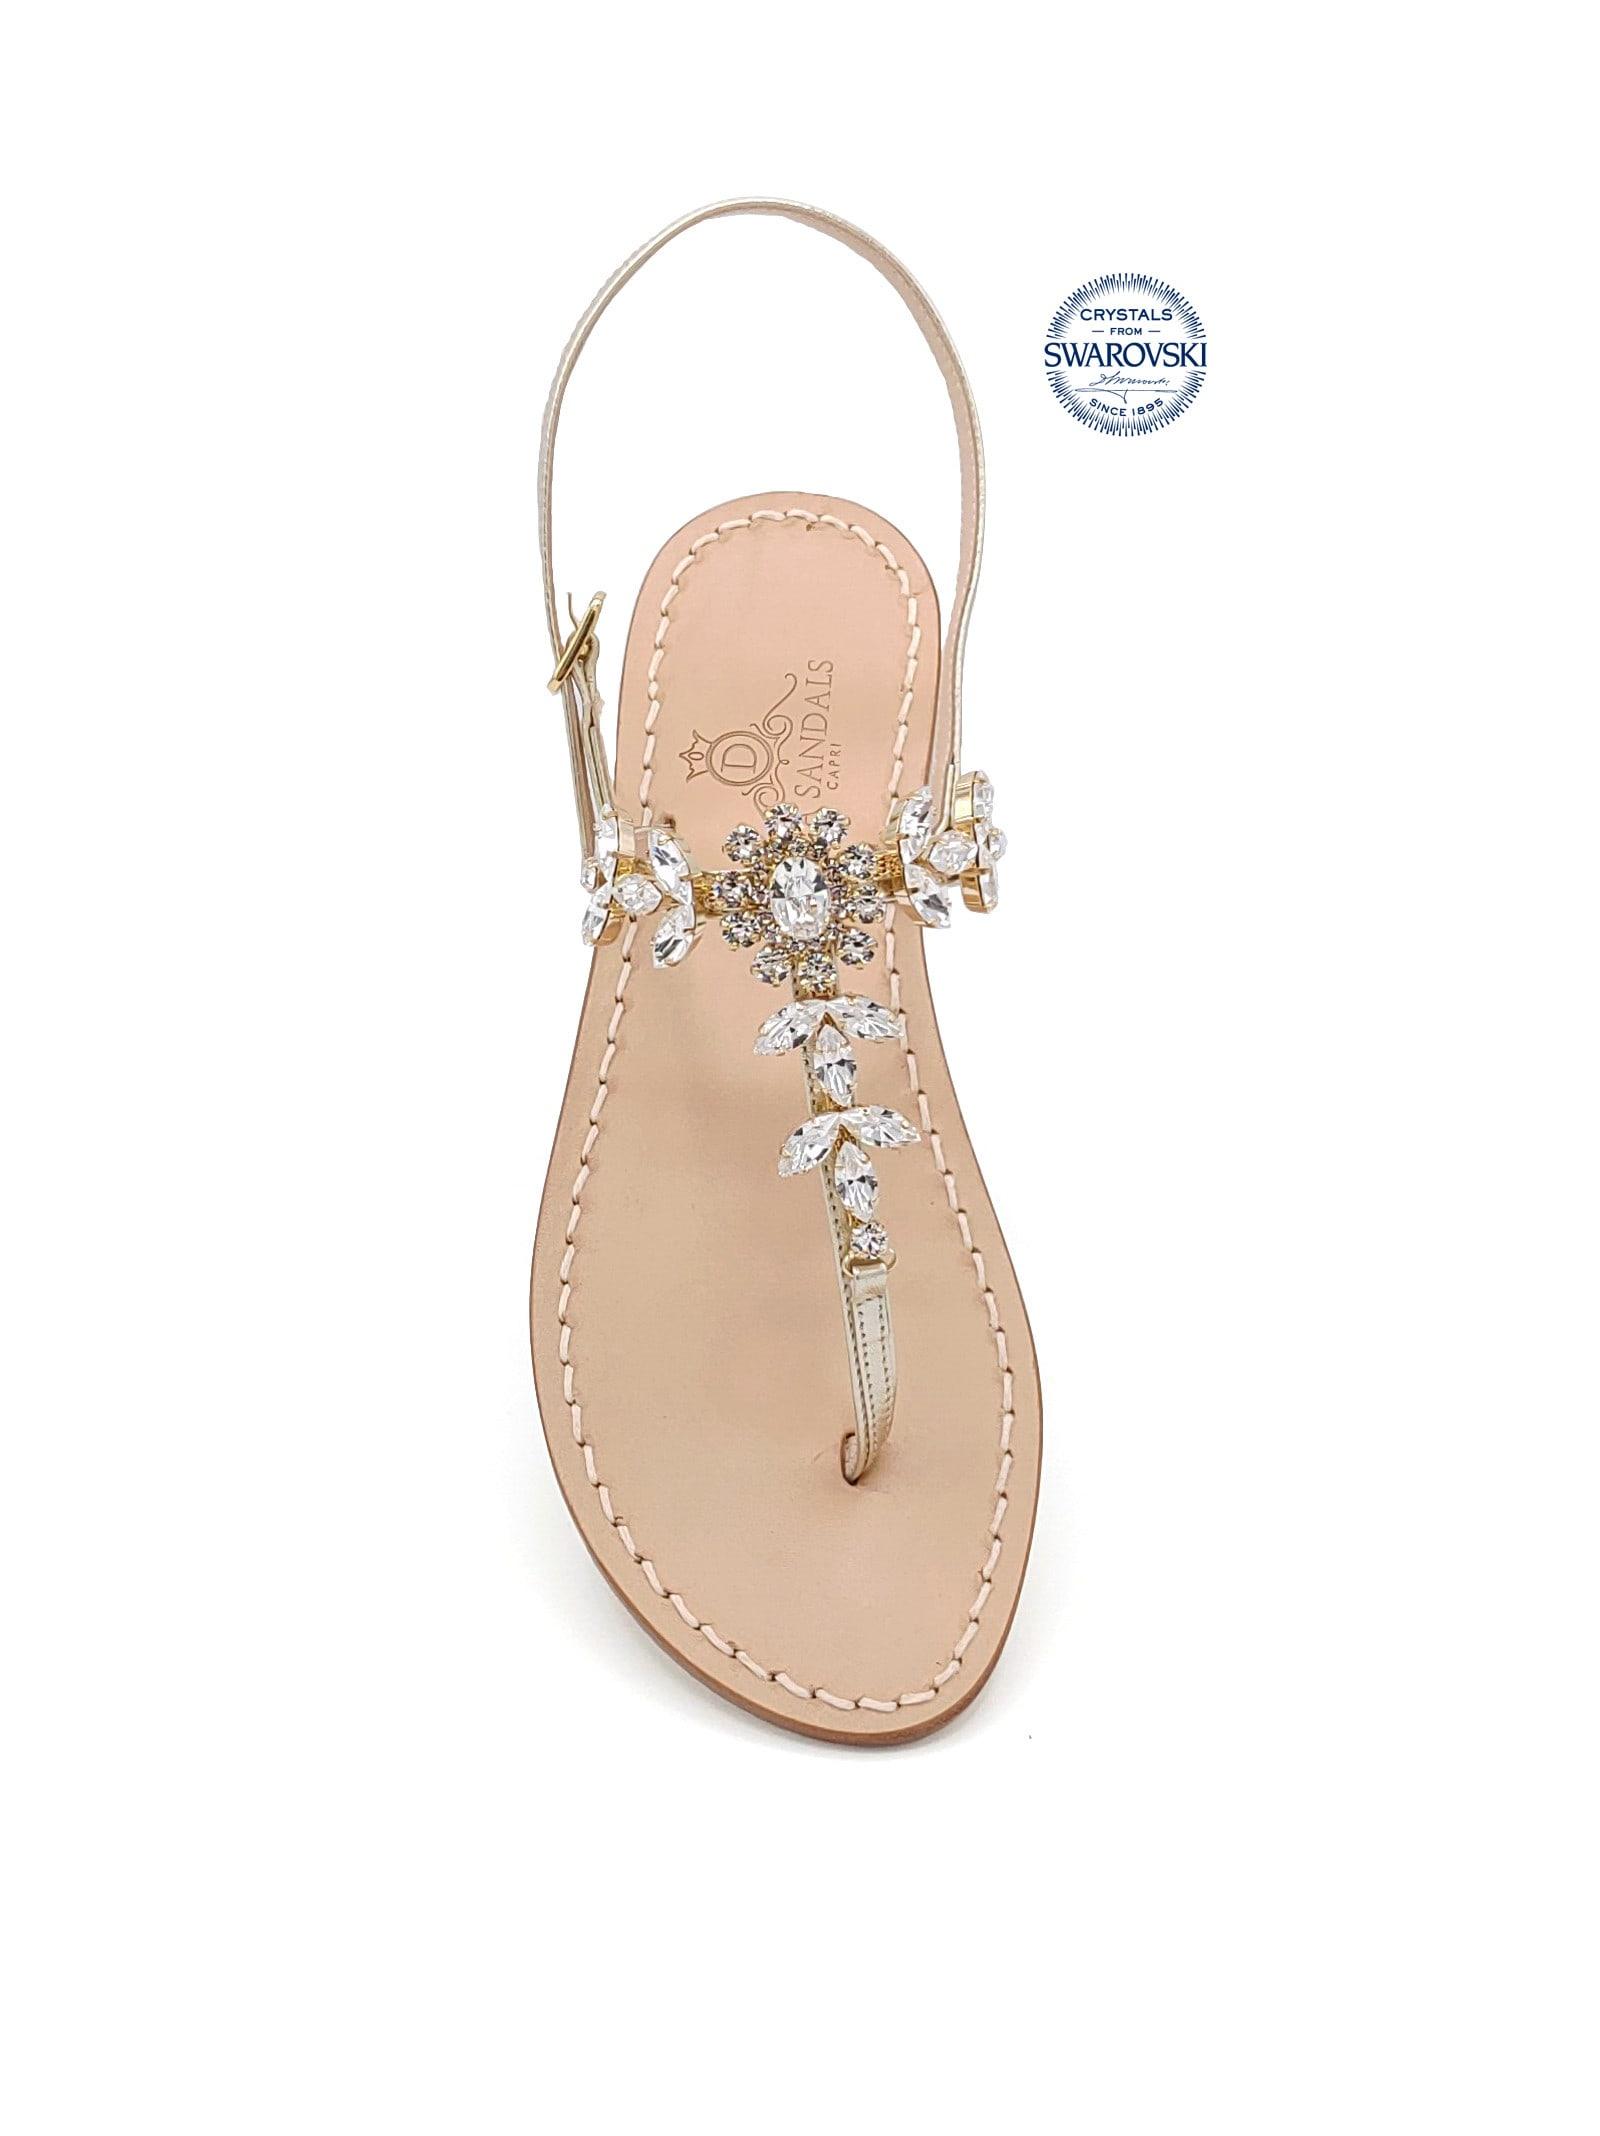 Marina Grande Flip Flops Thong Sandals